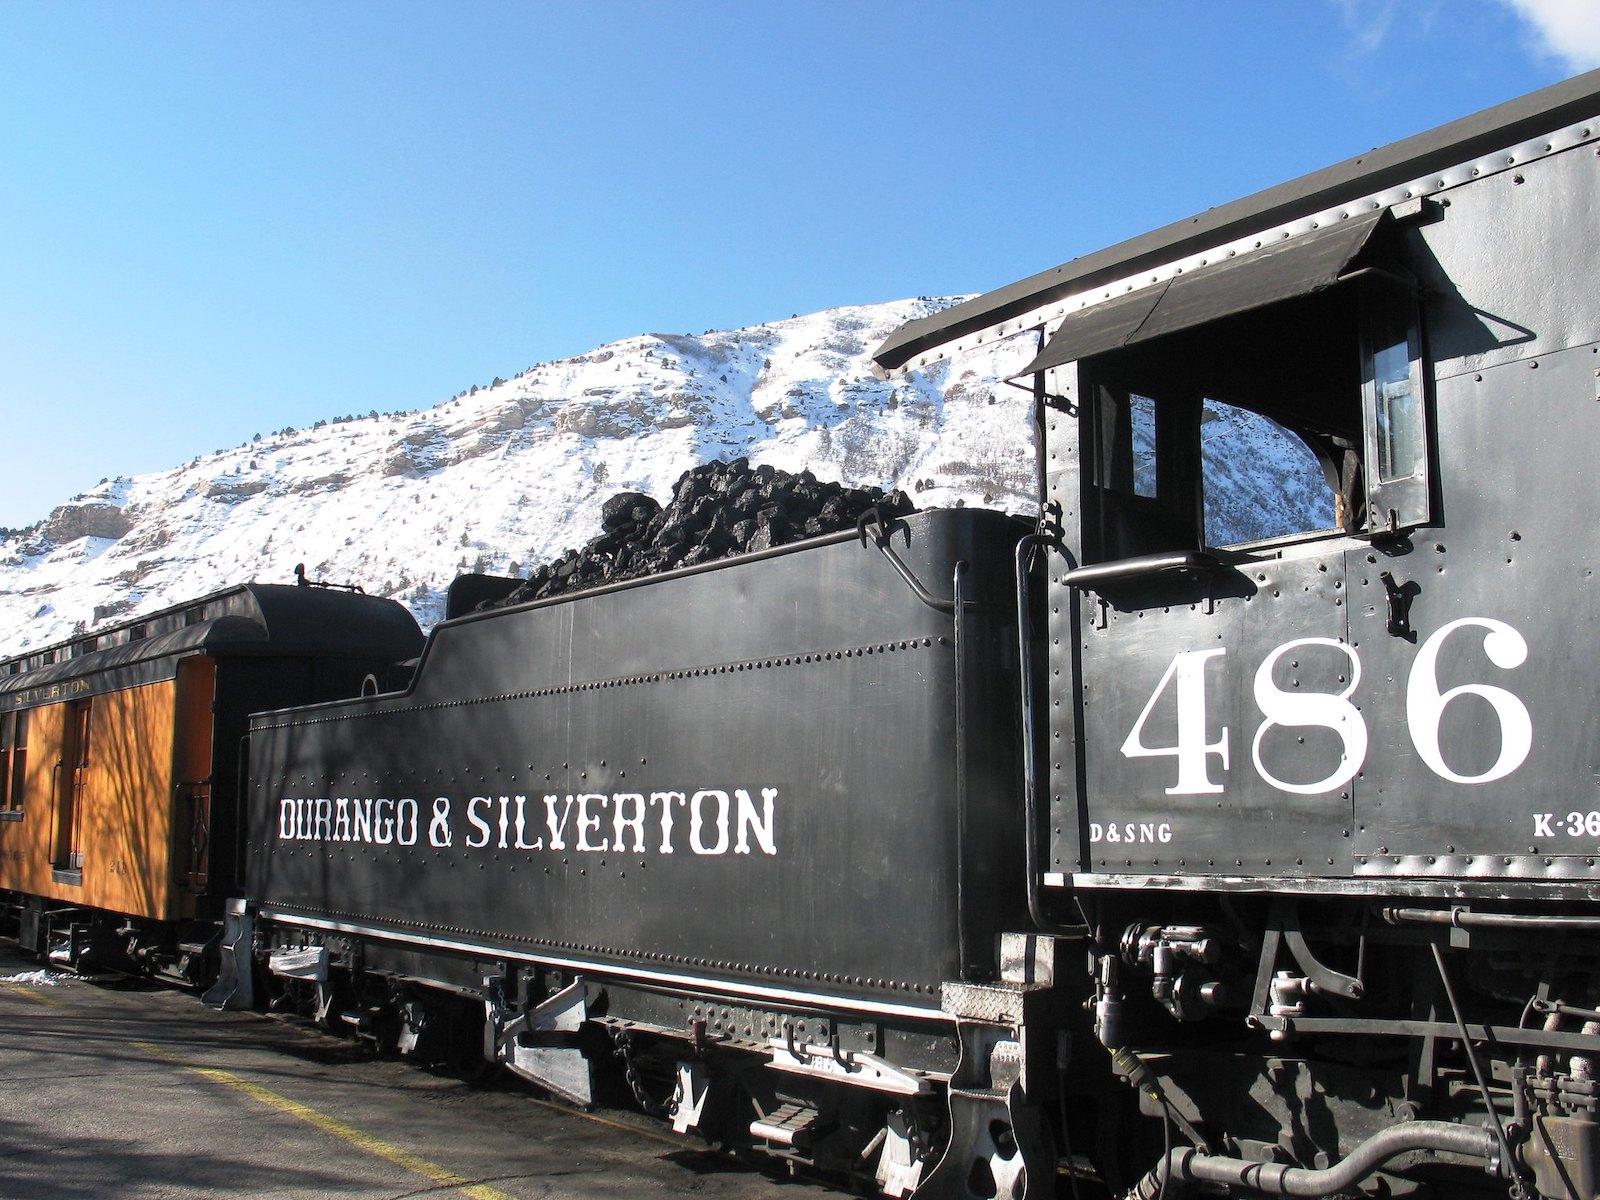 Image of the Durango Silverton Train in Colorado